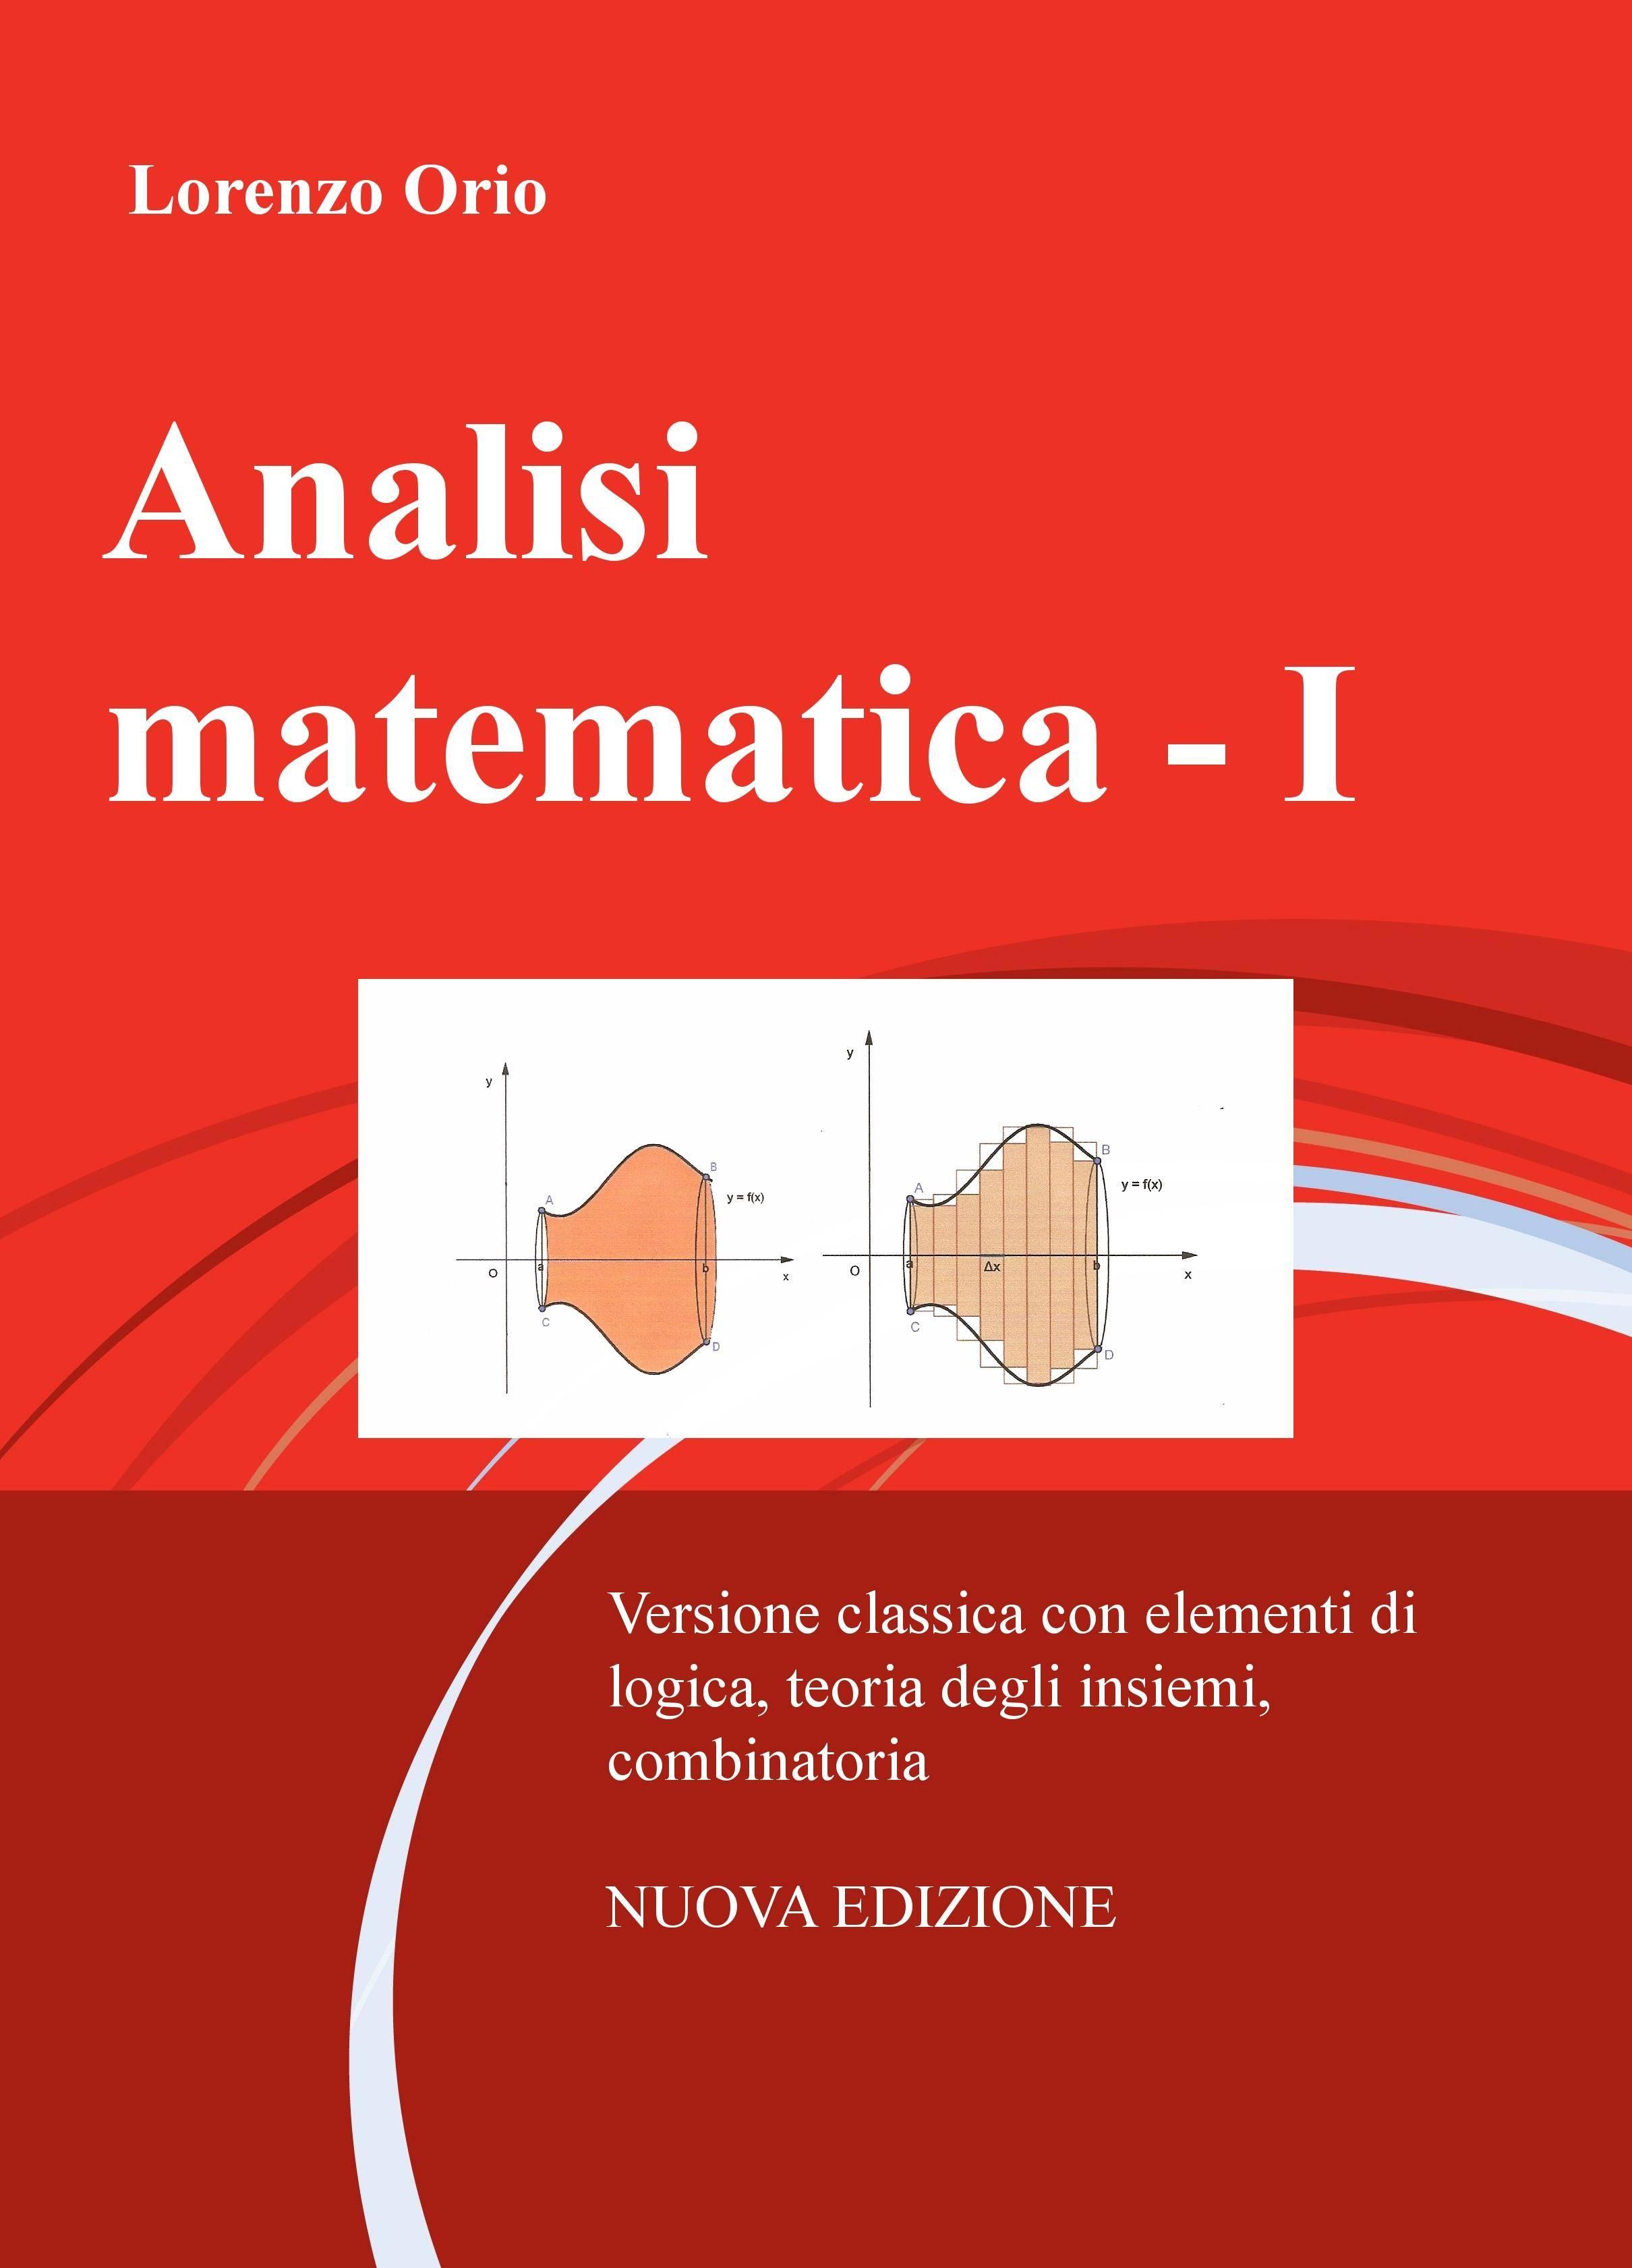 Analisi matematica – I